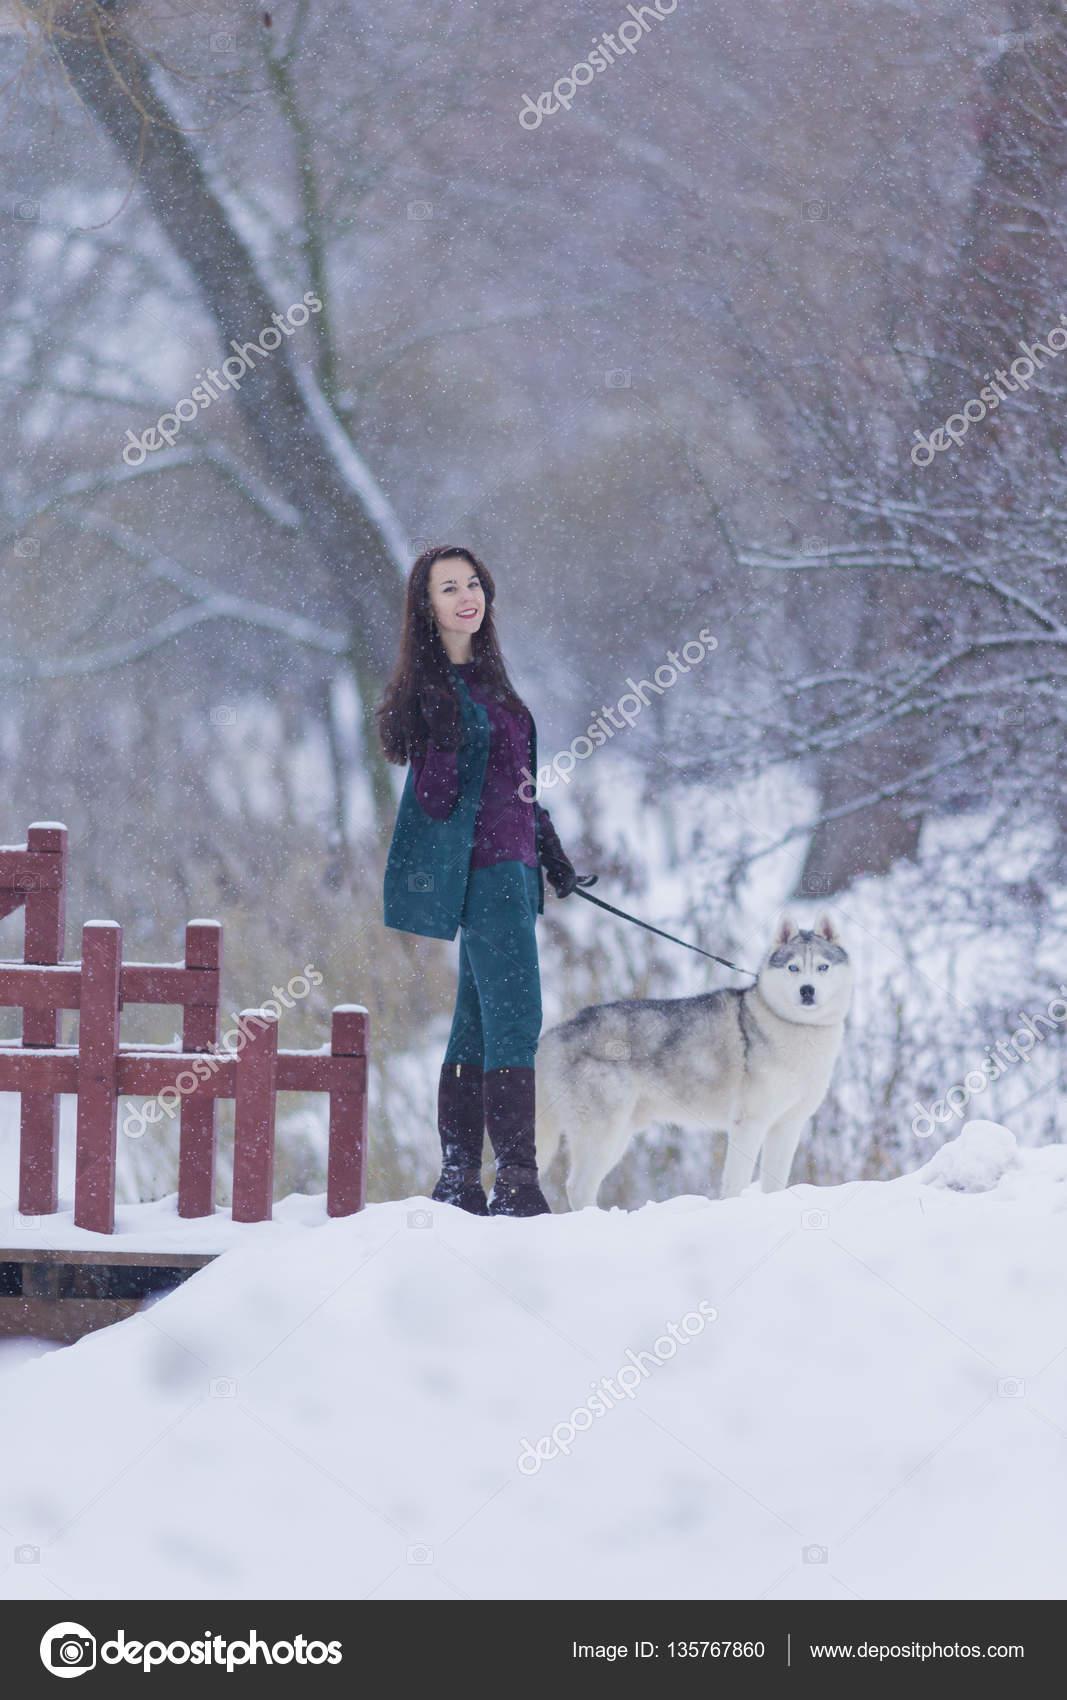 c3d75a3c906a Ζώα και κατοικίδια έννοια και οι ιδέες. Αρκετά ήσυχο Μελαχρινή καυκάσιος με  ο μεγαλόσωμος σκύλος της κατά τη διάρκεια μια βόλτα στο Winter.